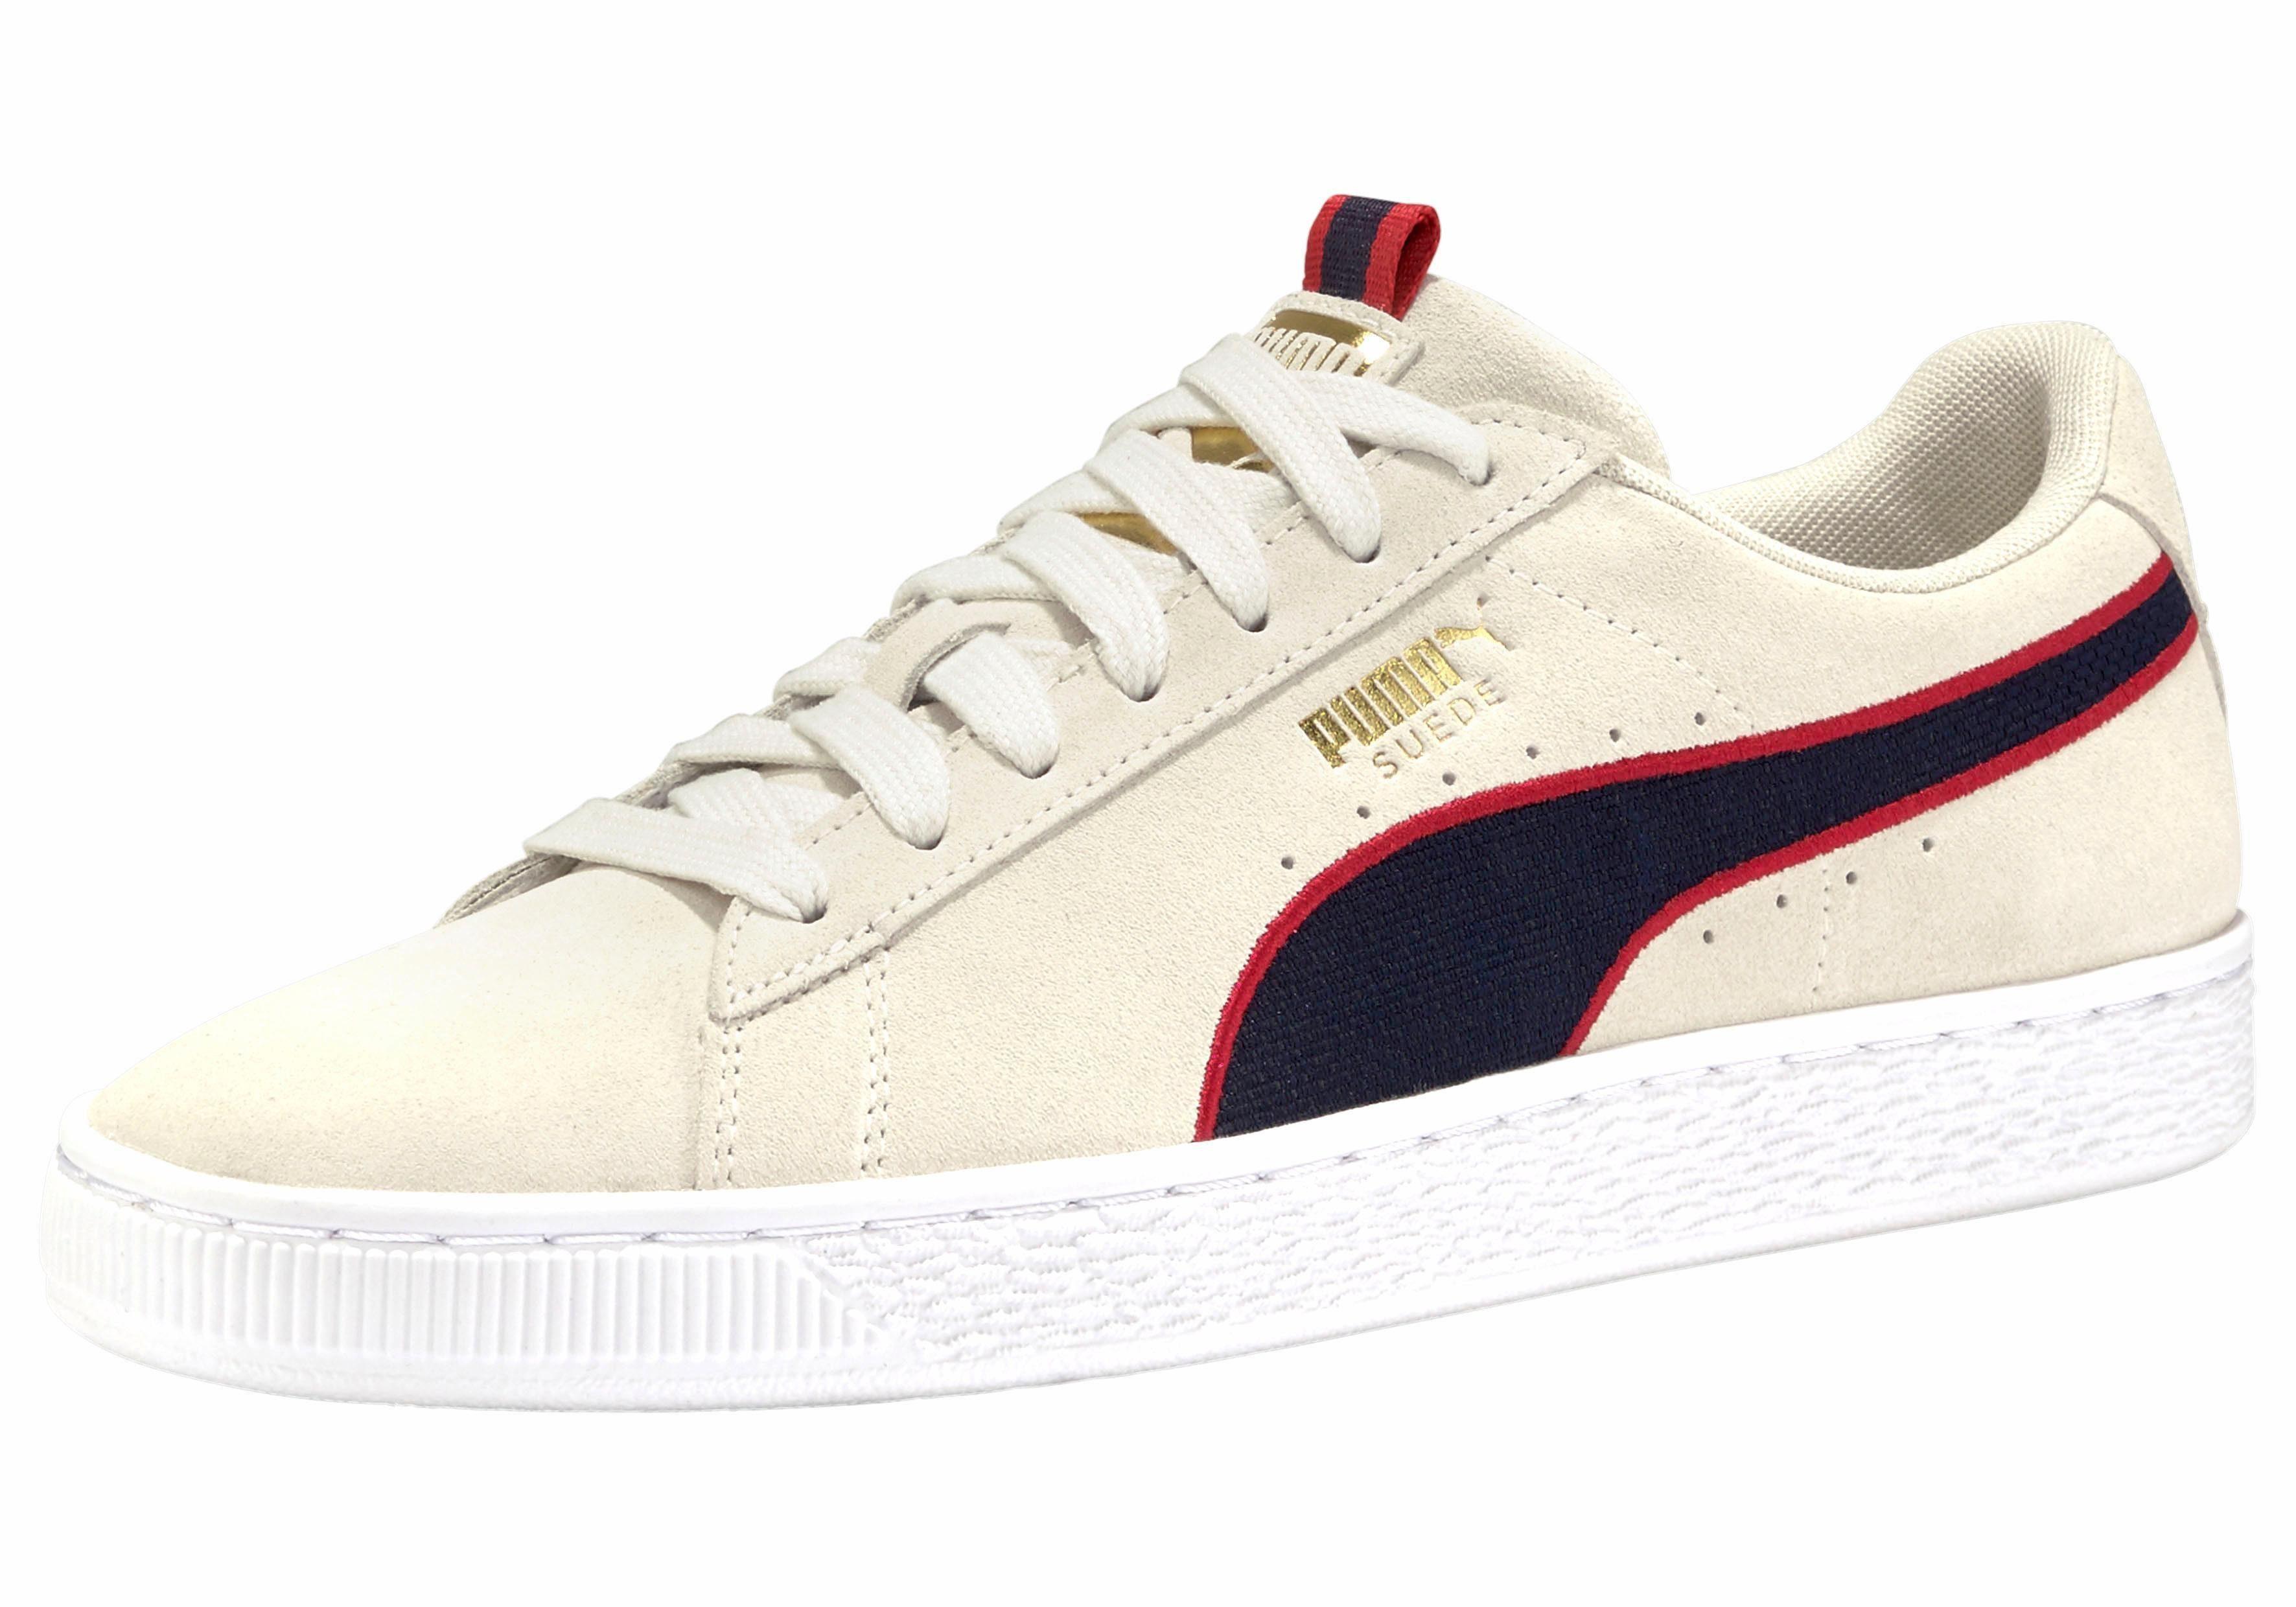 PUMA Suede Classic Sport Sneaker online kaufen  offwhite-dunkelblau-rot